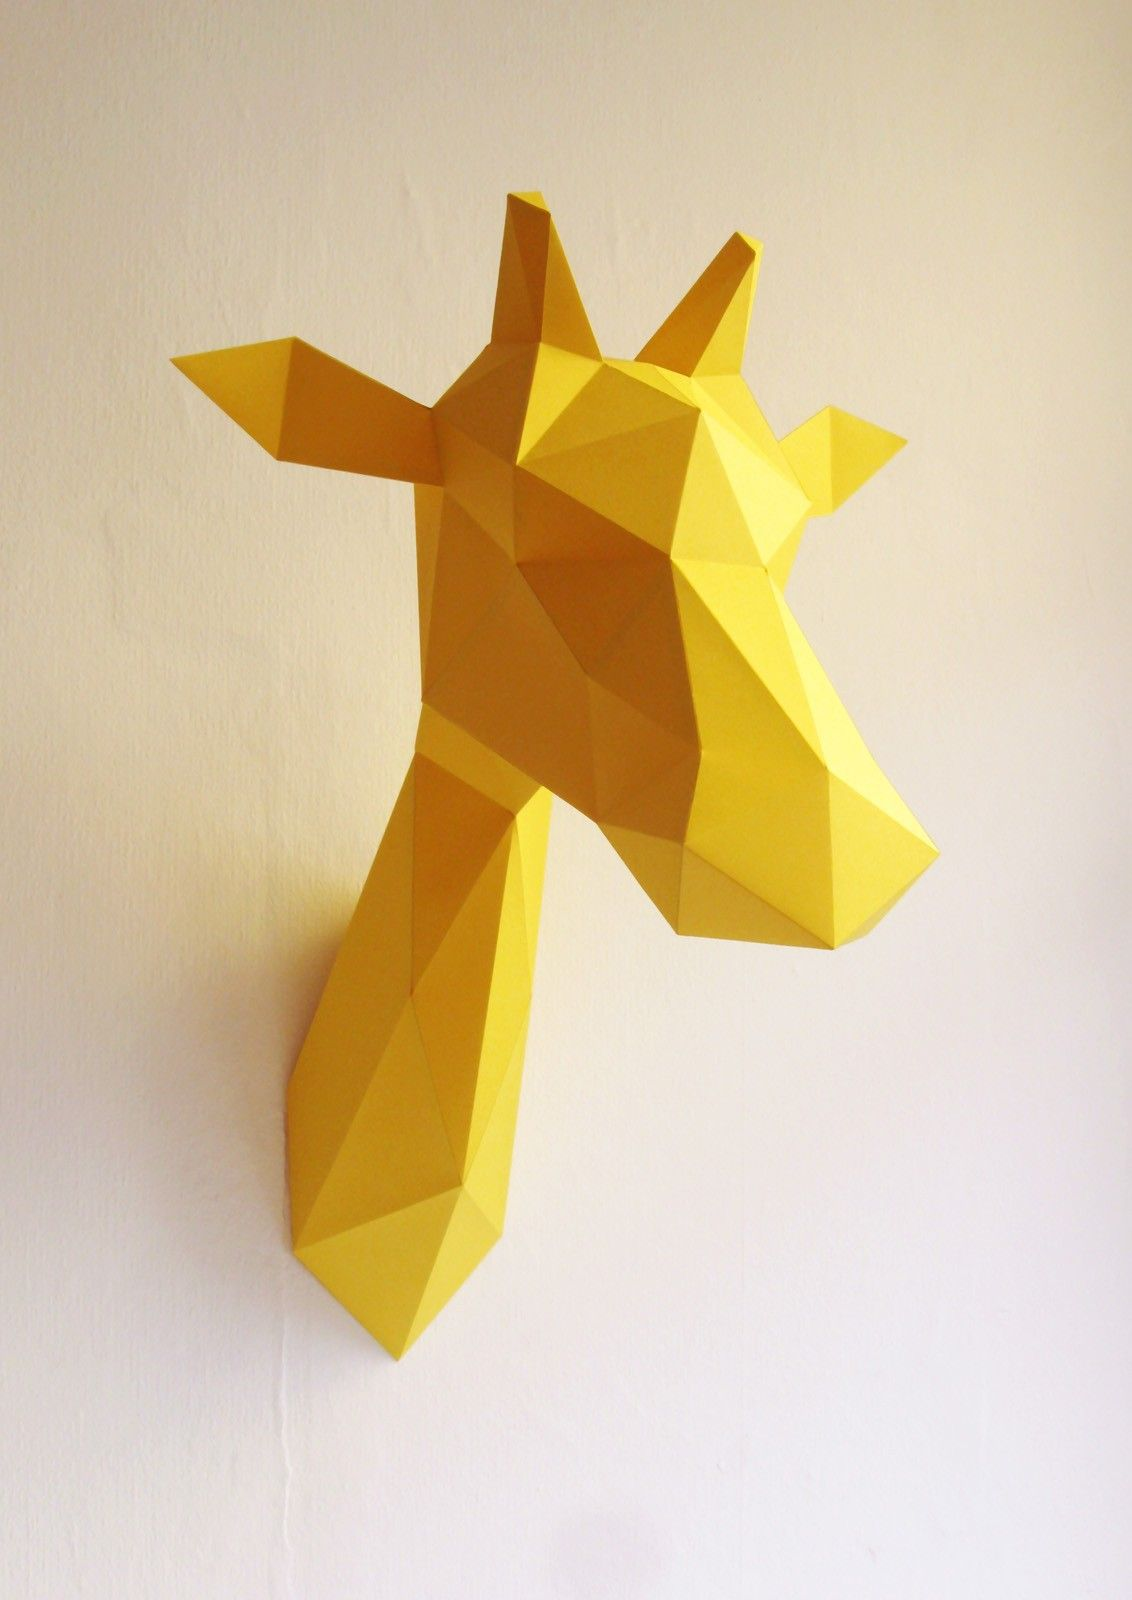 Origami en papier, tête de girafe jaune. - Origami paper ... - photo#2